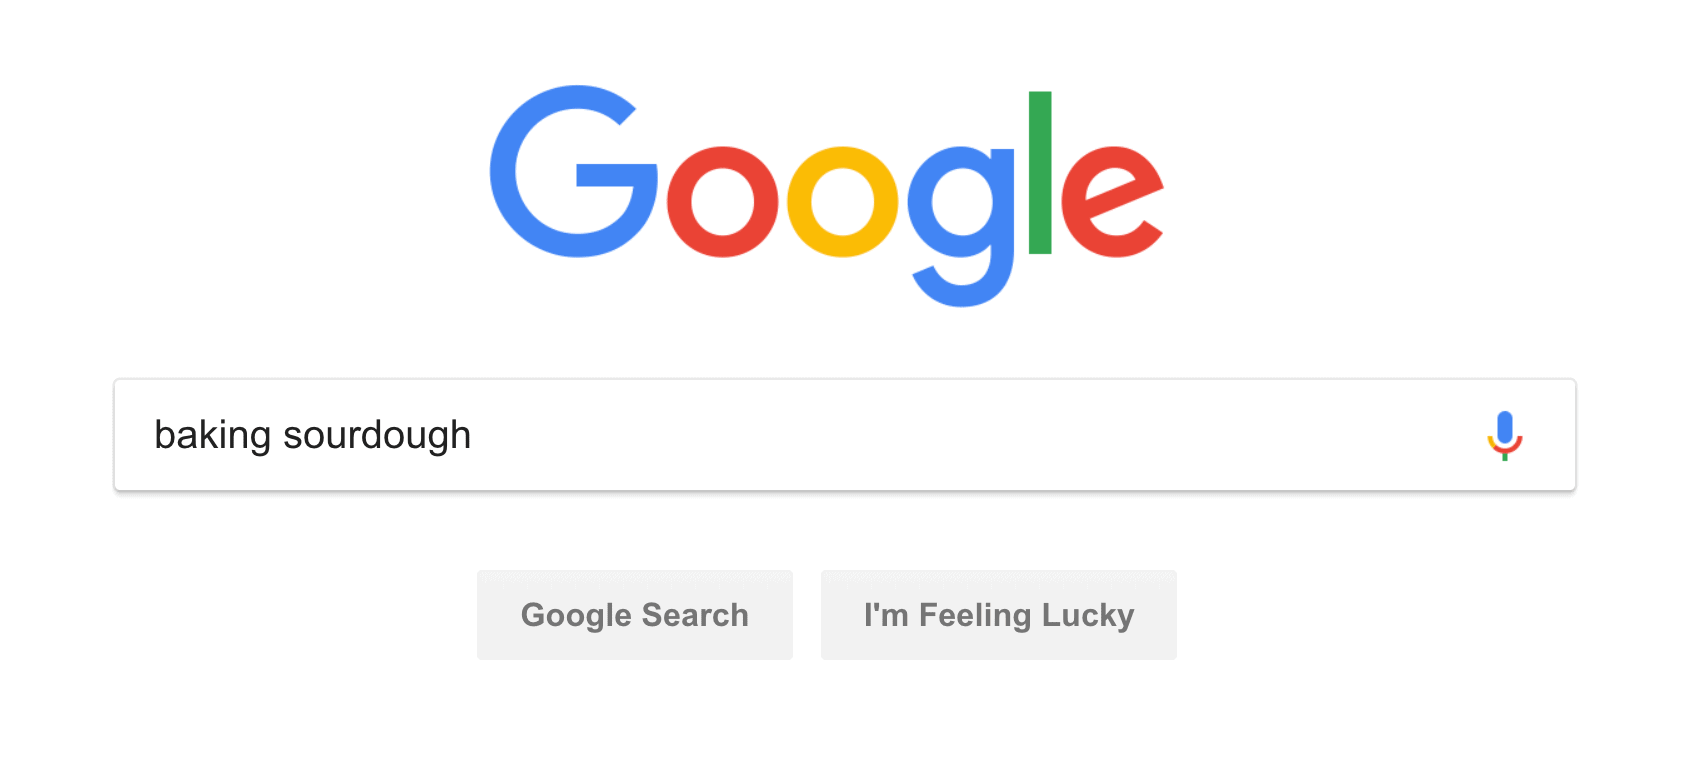 Sample Google search